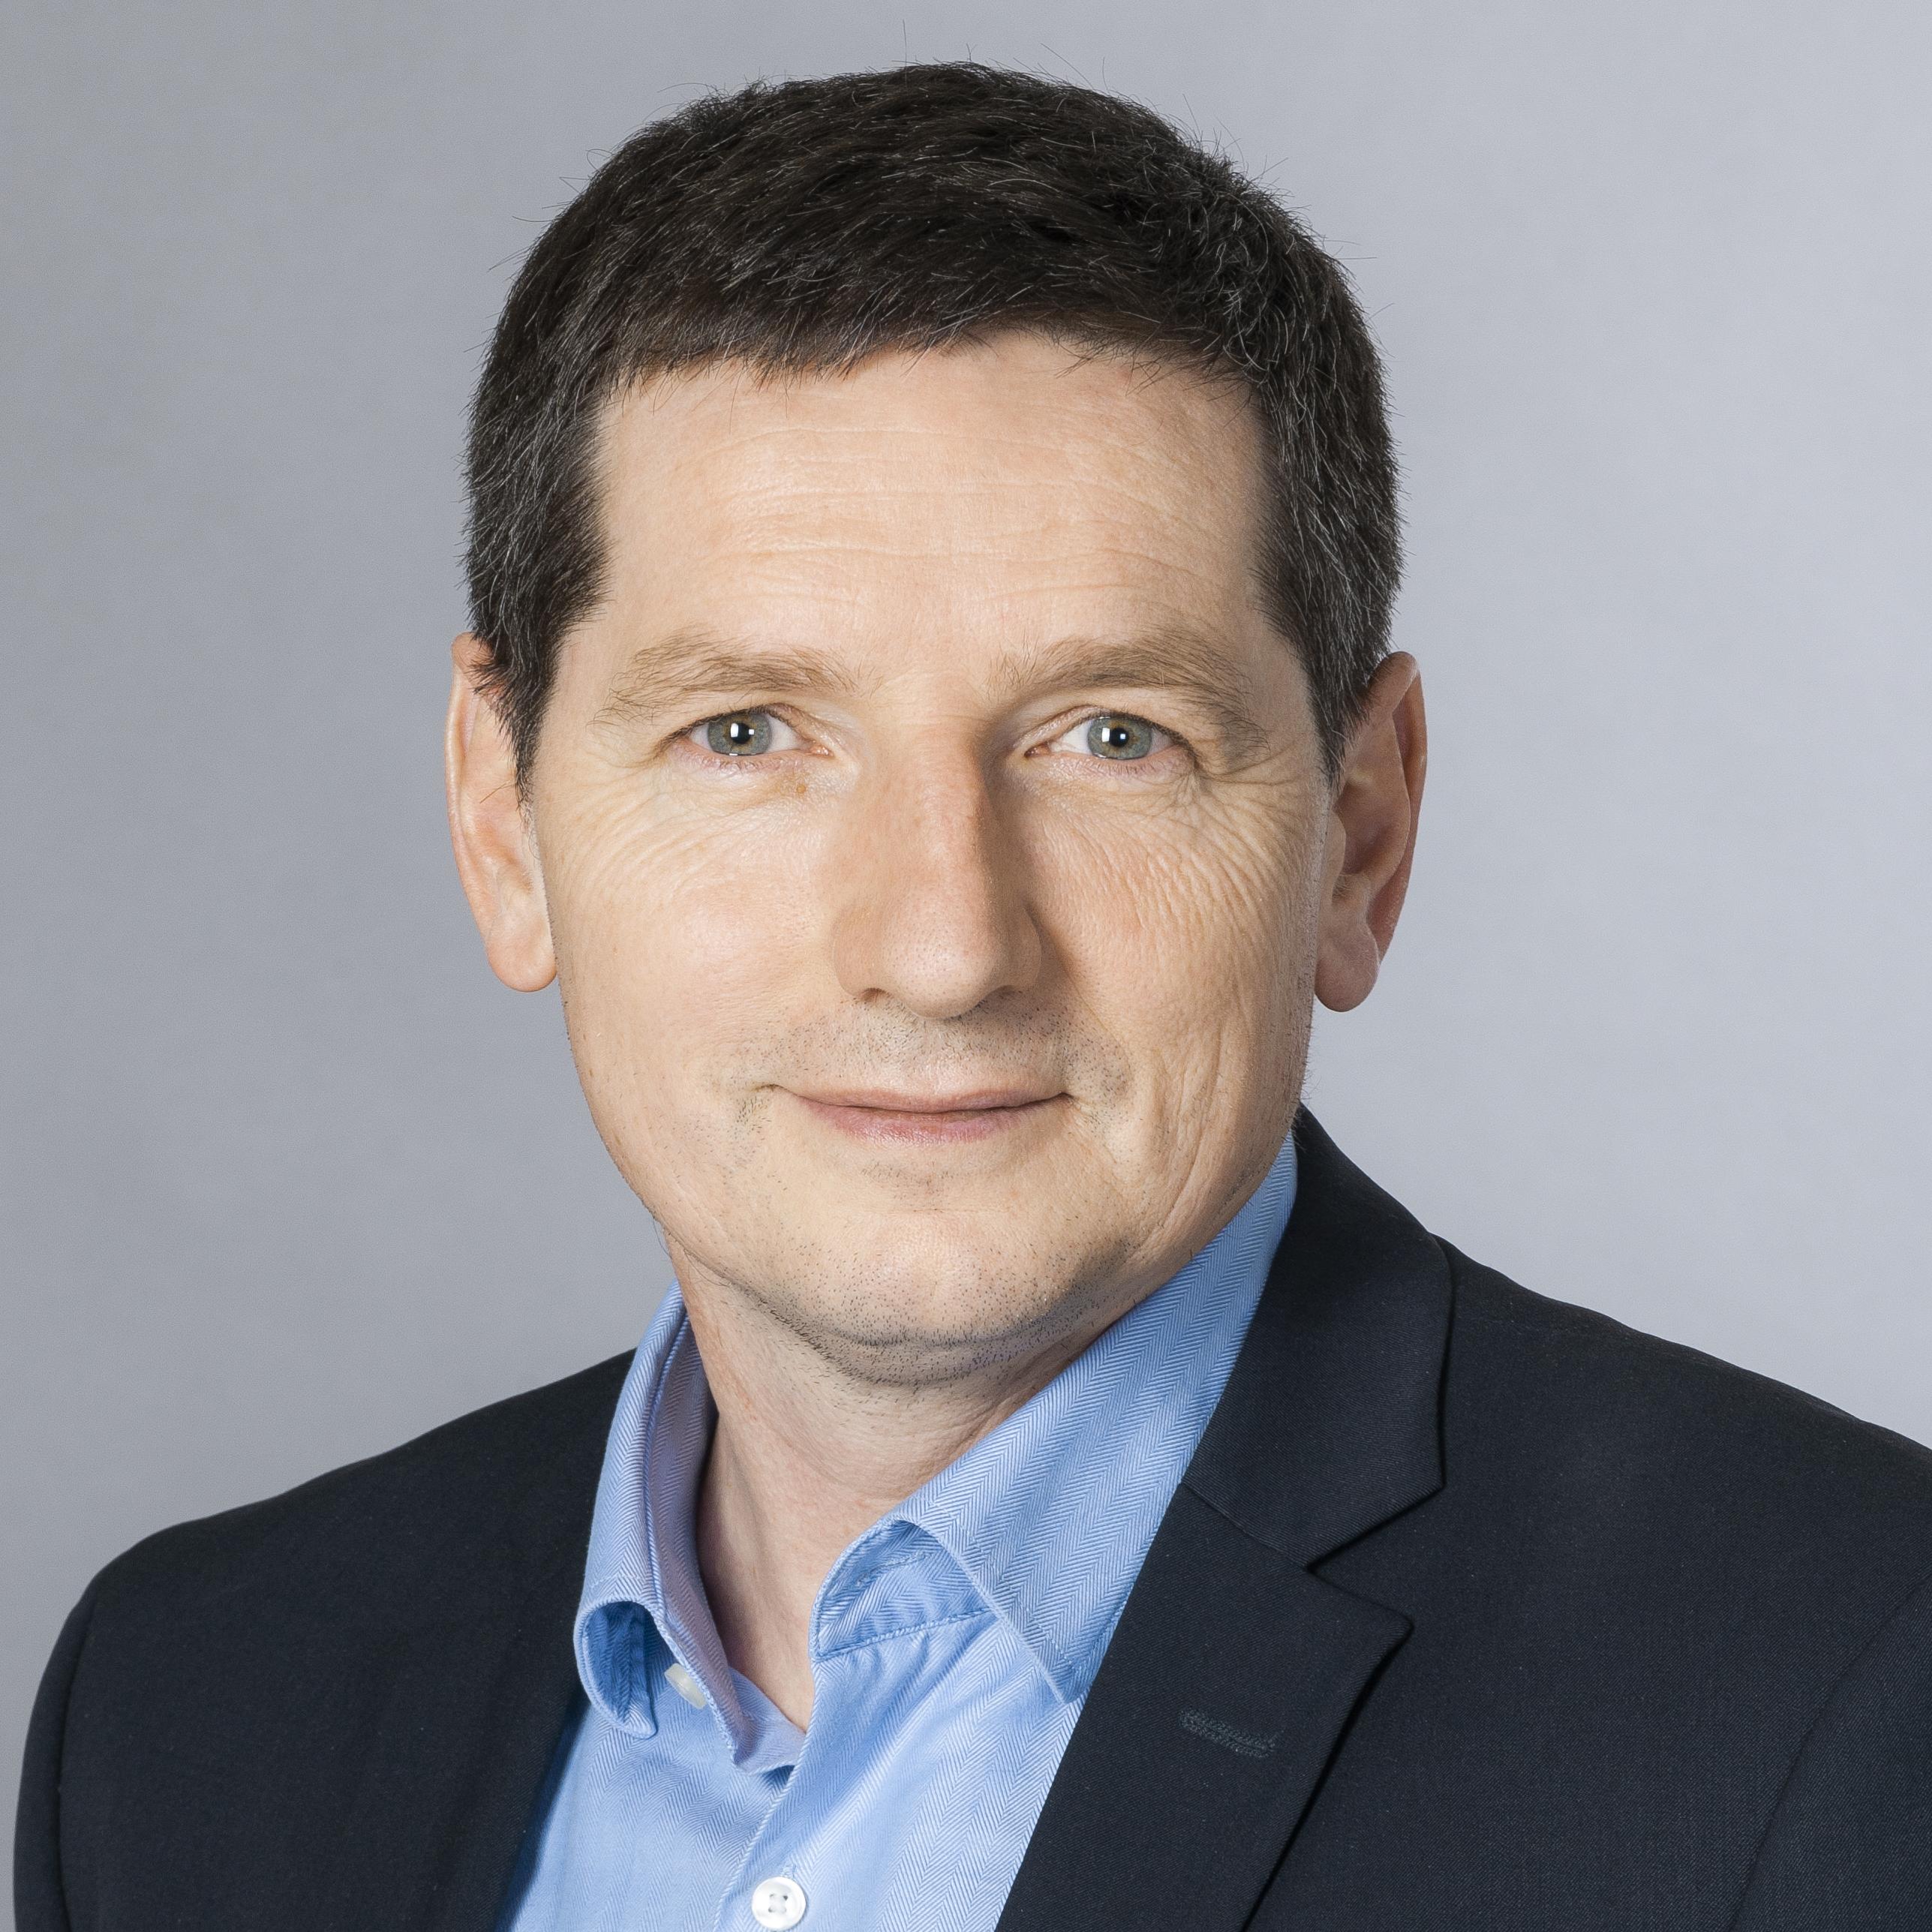 Jean-Michel Staerlé